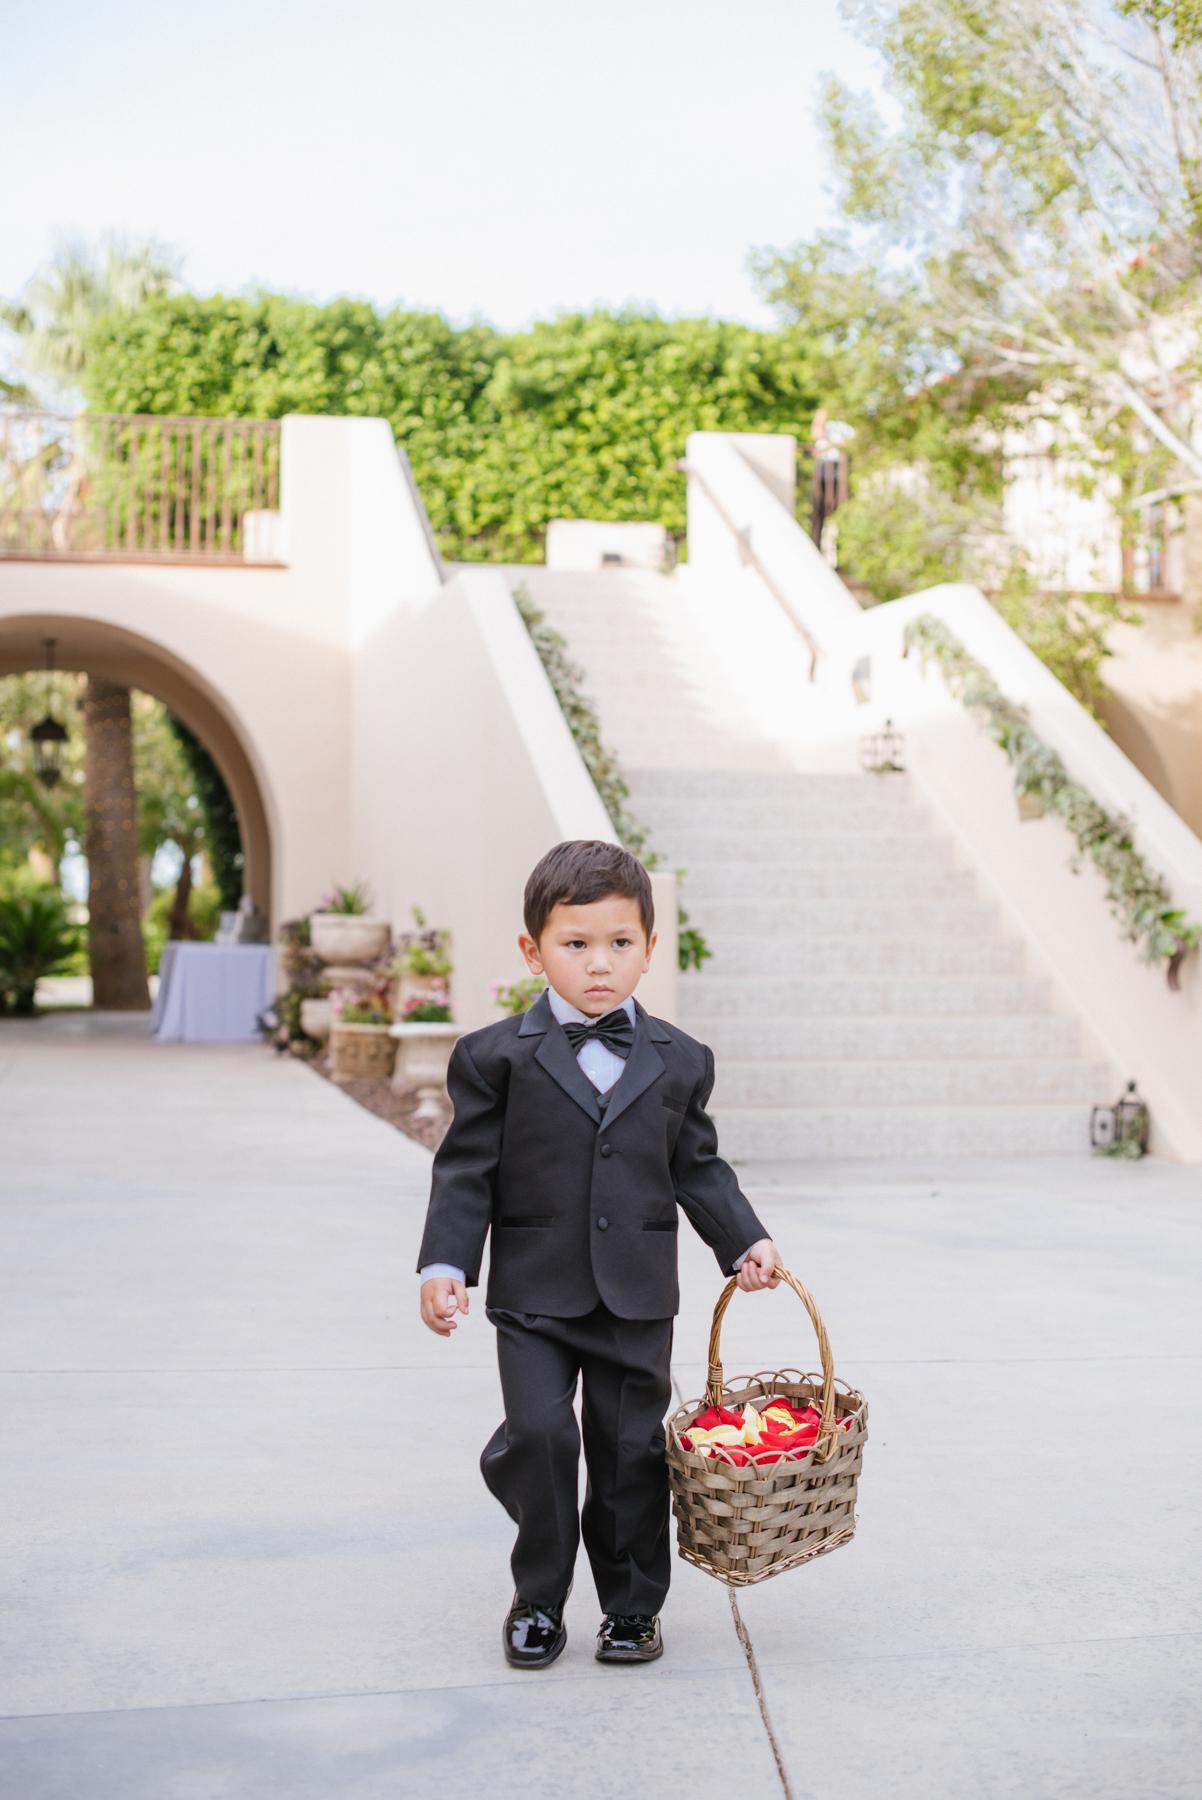 Secret Garden Event Center Wedding - Meredith Amadee Photography-88.jpg